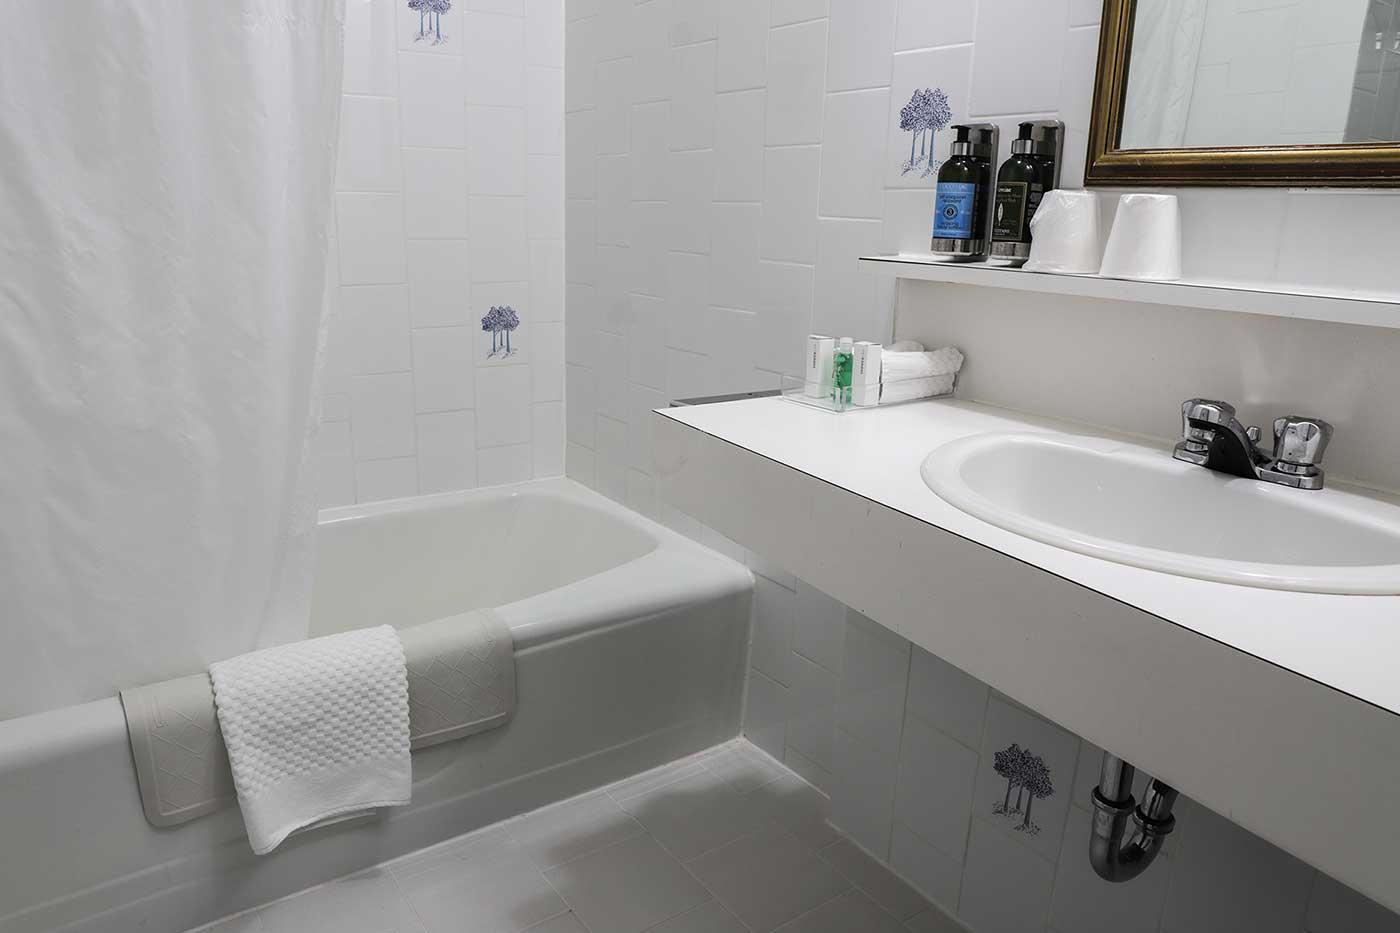 Bathroom in Room 202. Fort Garry Hotel, Winnipeg. Canada.